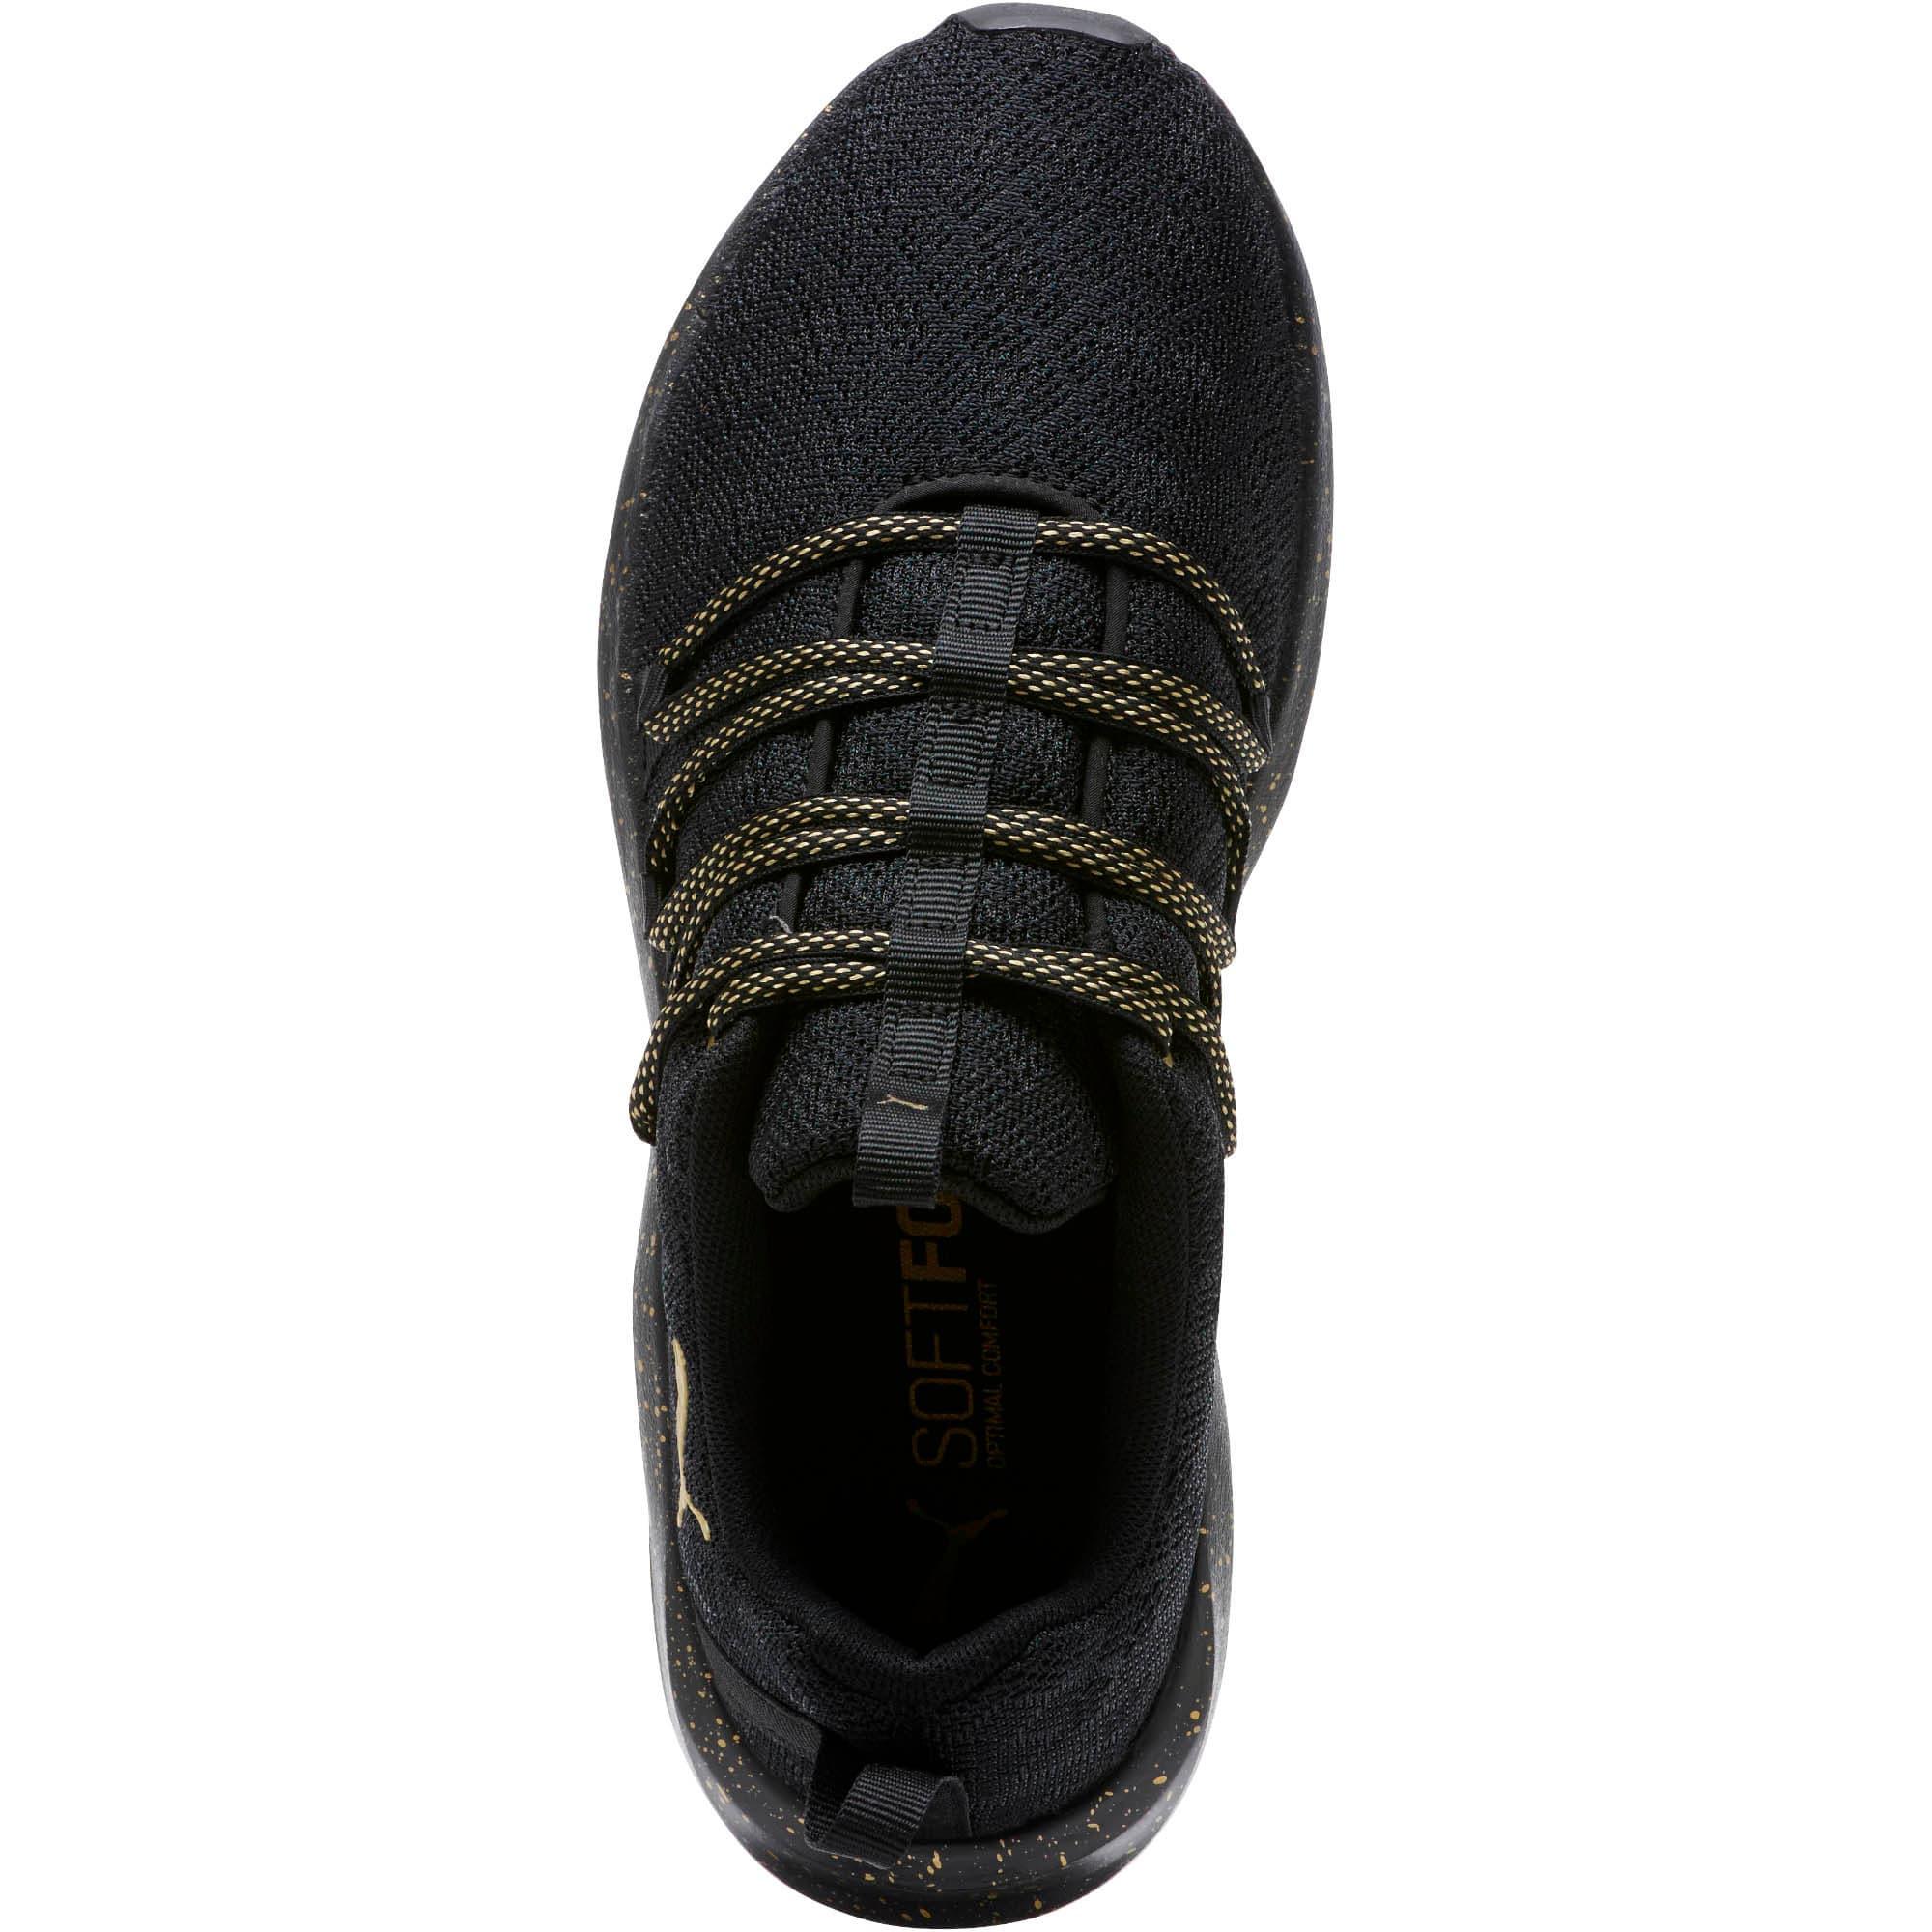 Thumbnail 5 of Prowl Alt Mesh Speckle Women's Training Shoes, Puma Black-Puma Team Gold, medium